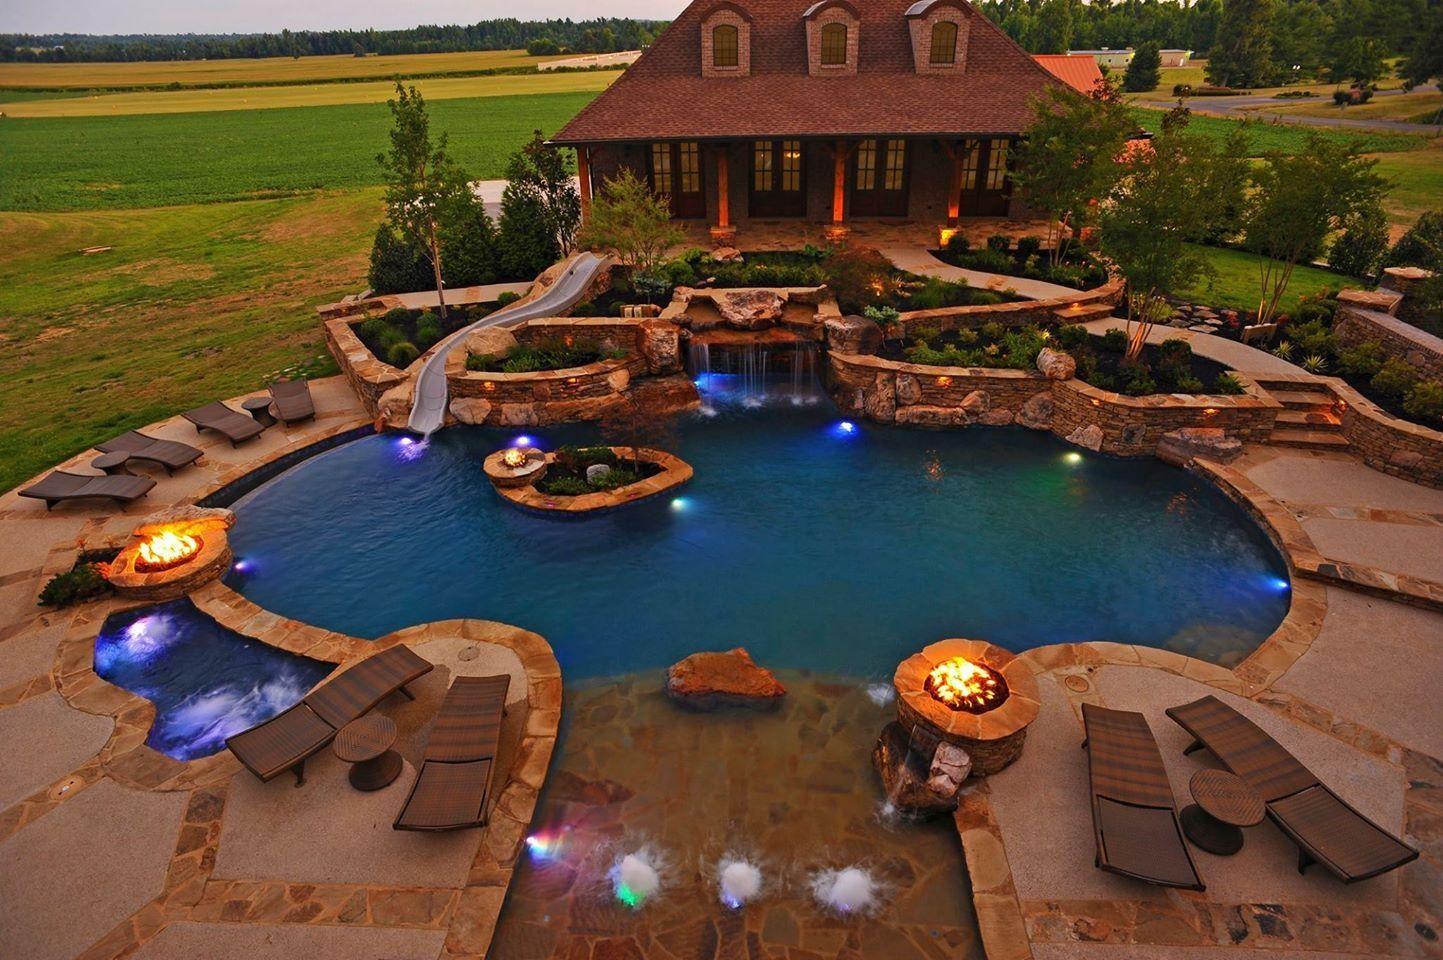 Dreamy | Luxury pools backyard, Backyard pool, Dream pools